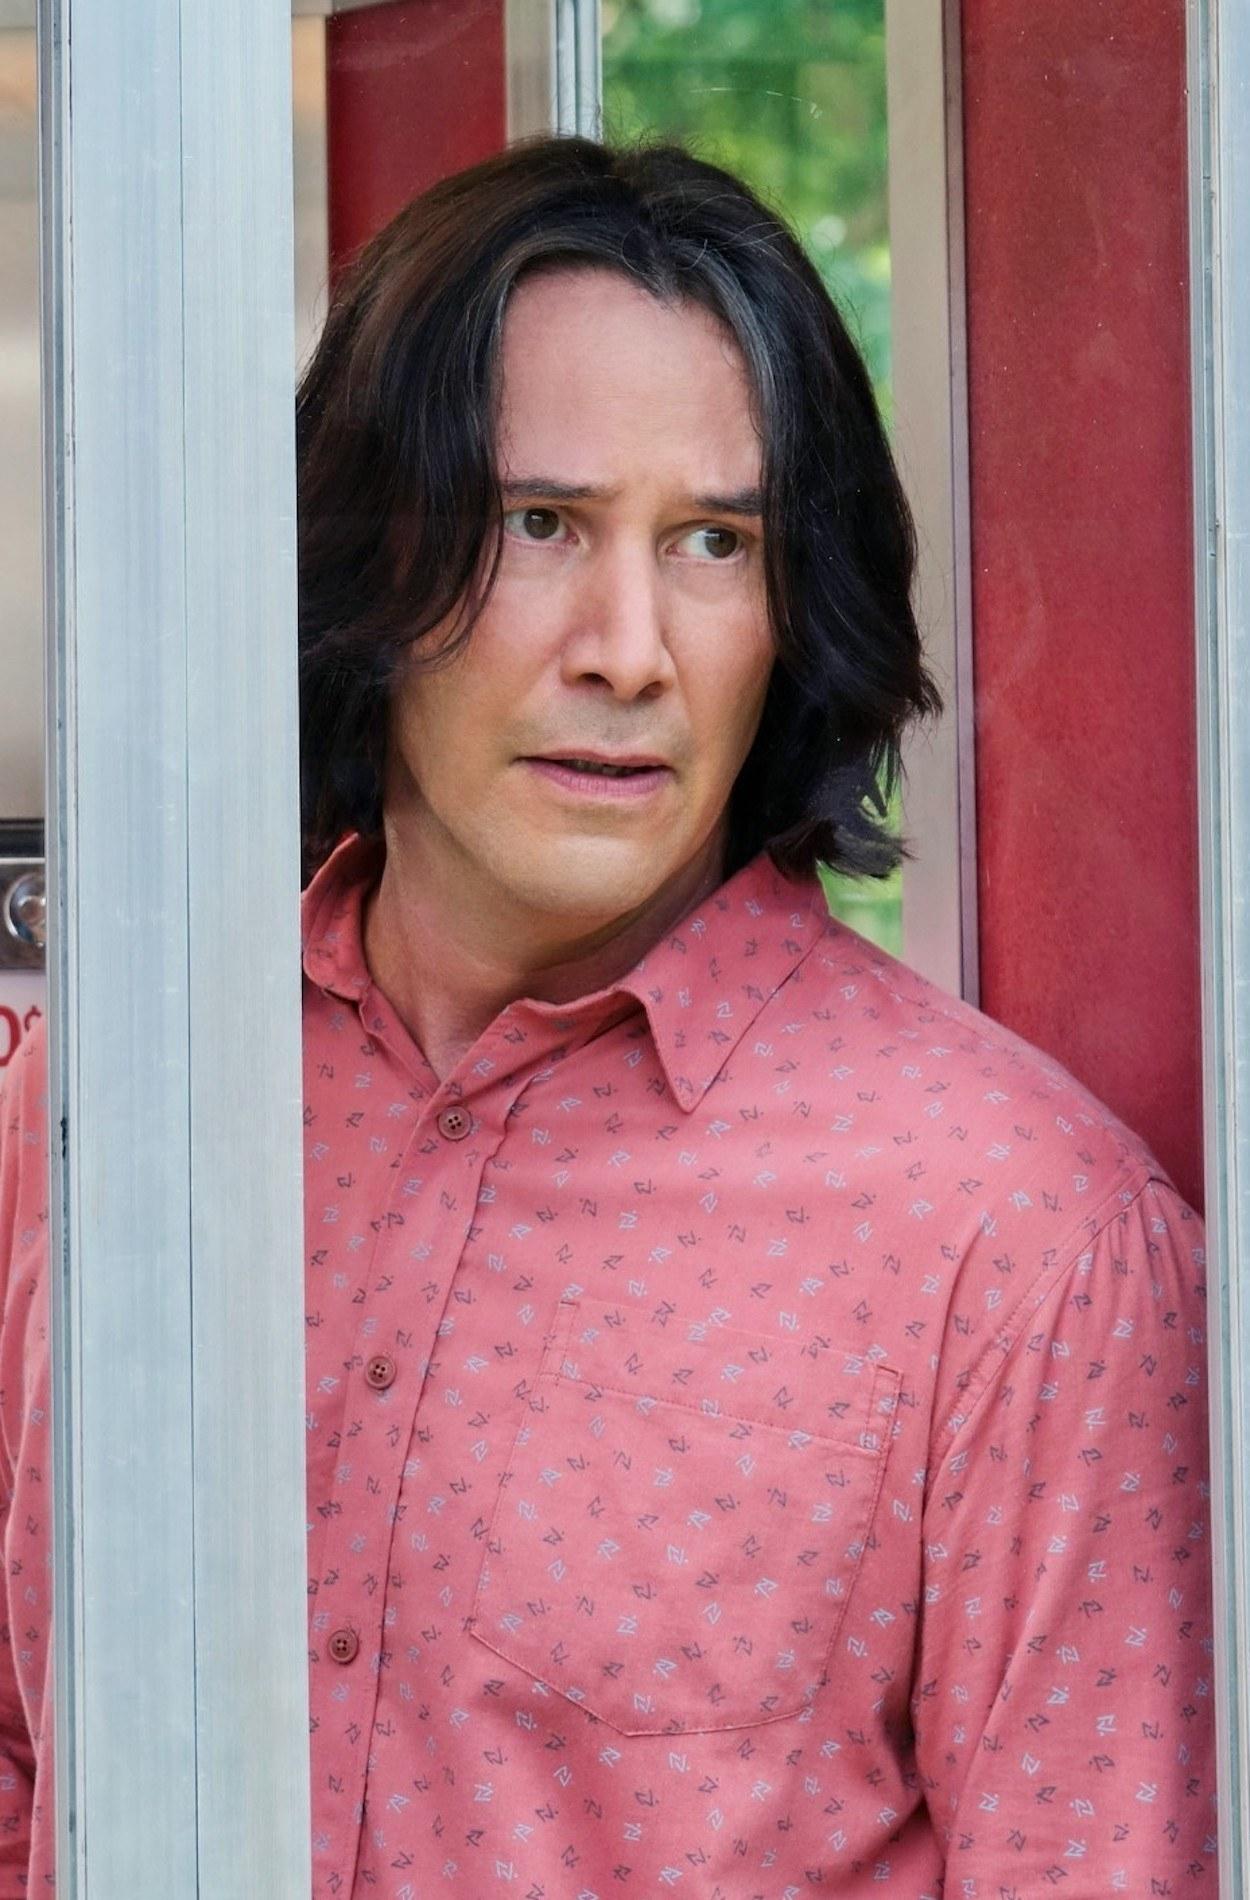 Keanu Reeves standing in a phone booth looking confused